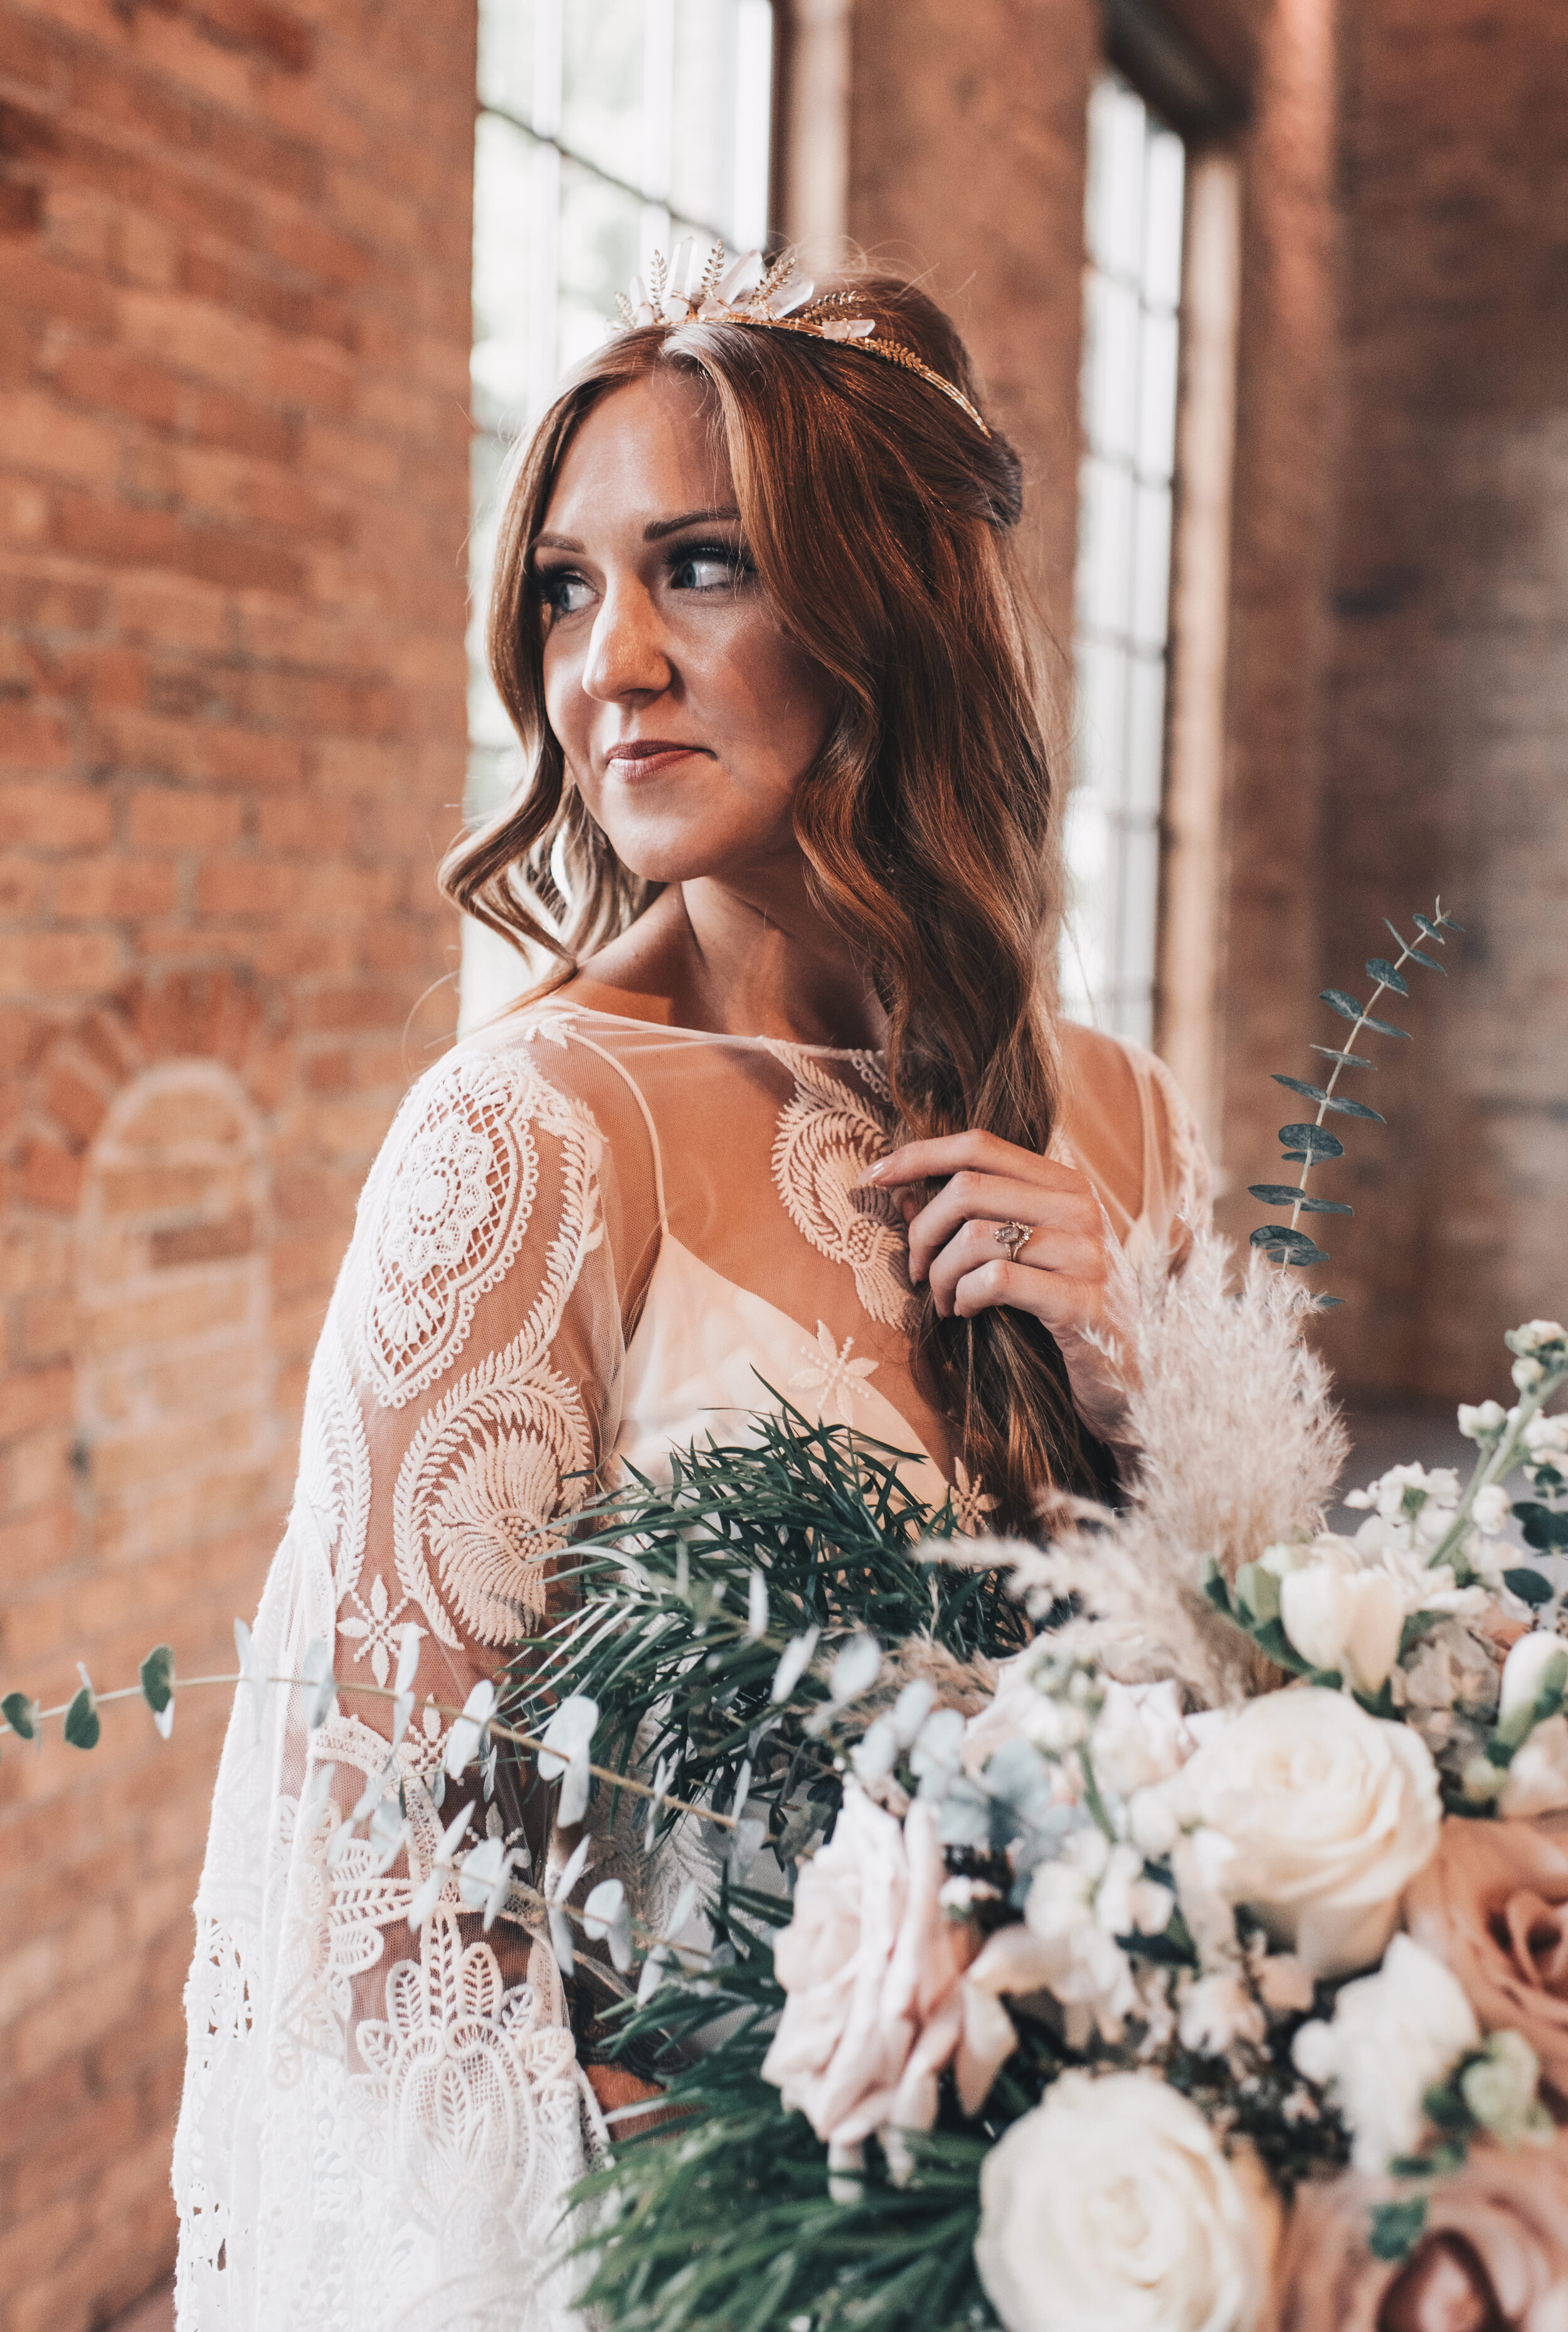 Modern Industrial Wedding, The Brix on the Fox, The BRIX, Chicago Industrial Wedding, Modern Midwest Wedding, The Brix on the Fox Wedding, The BRIX Wedding, Industrial Modern Boho Bride